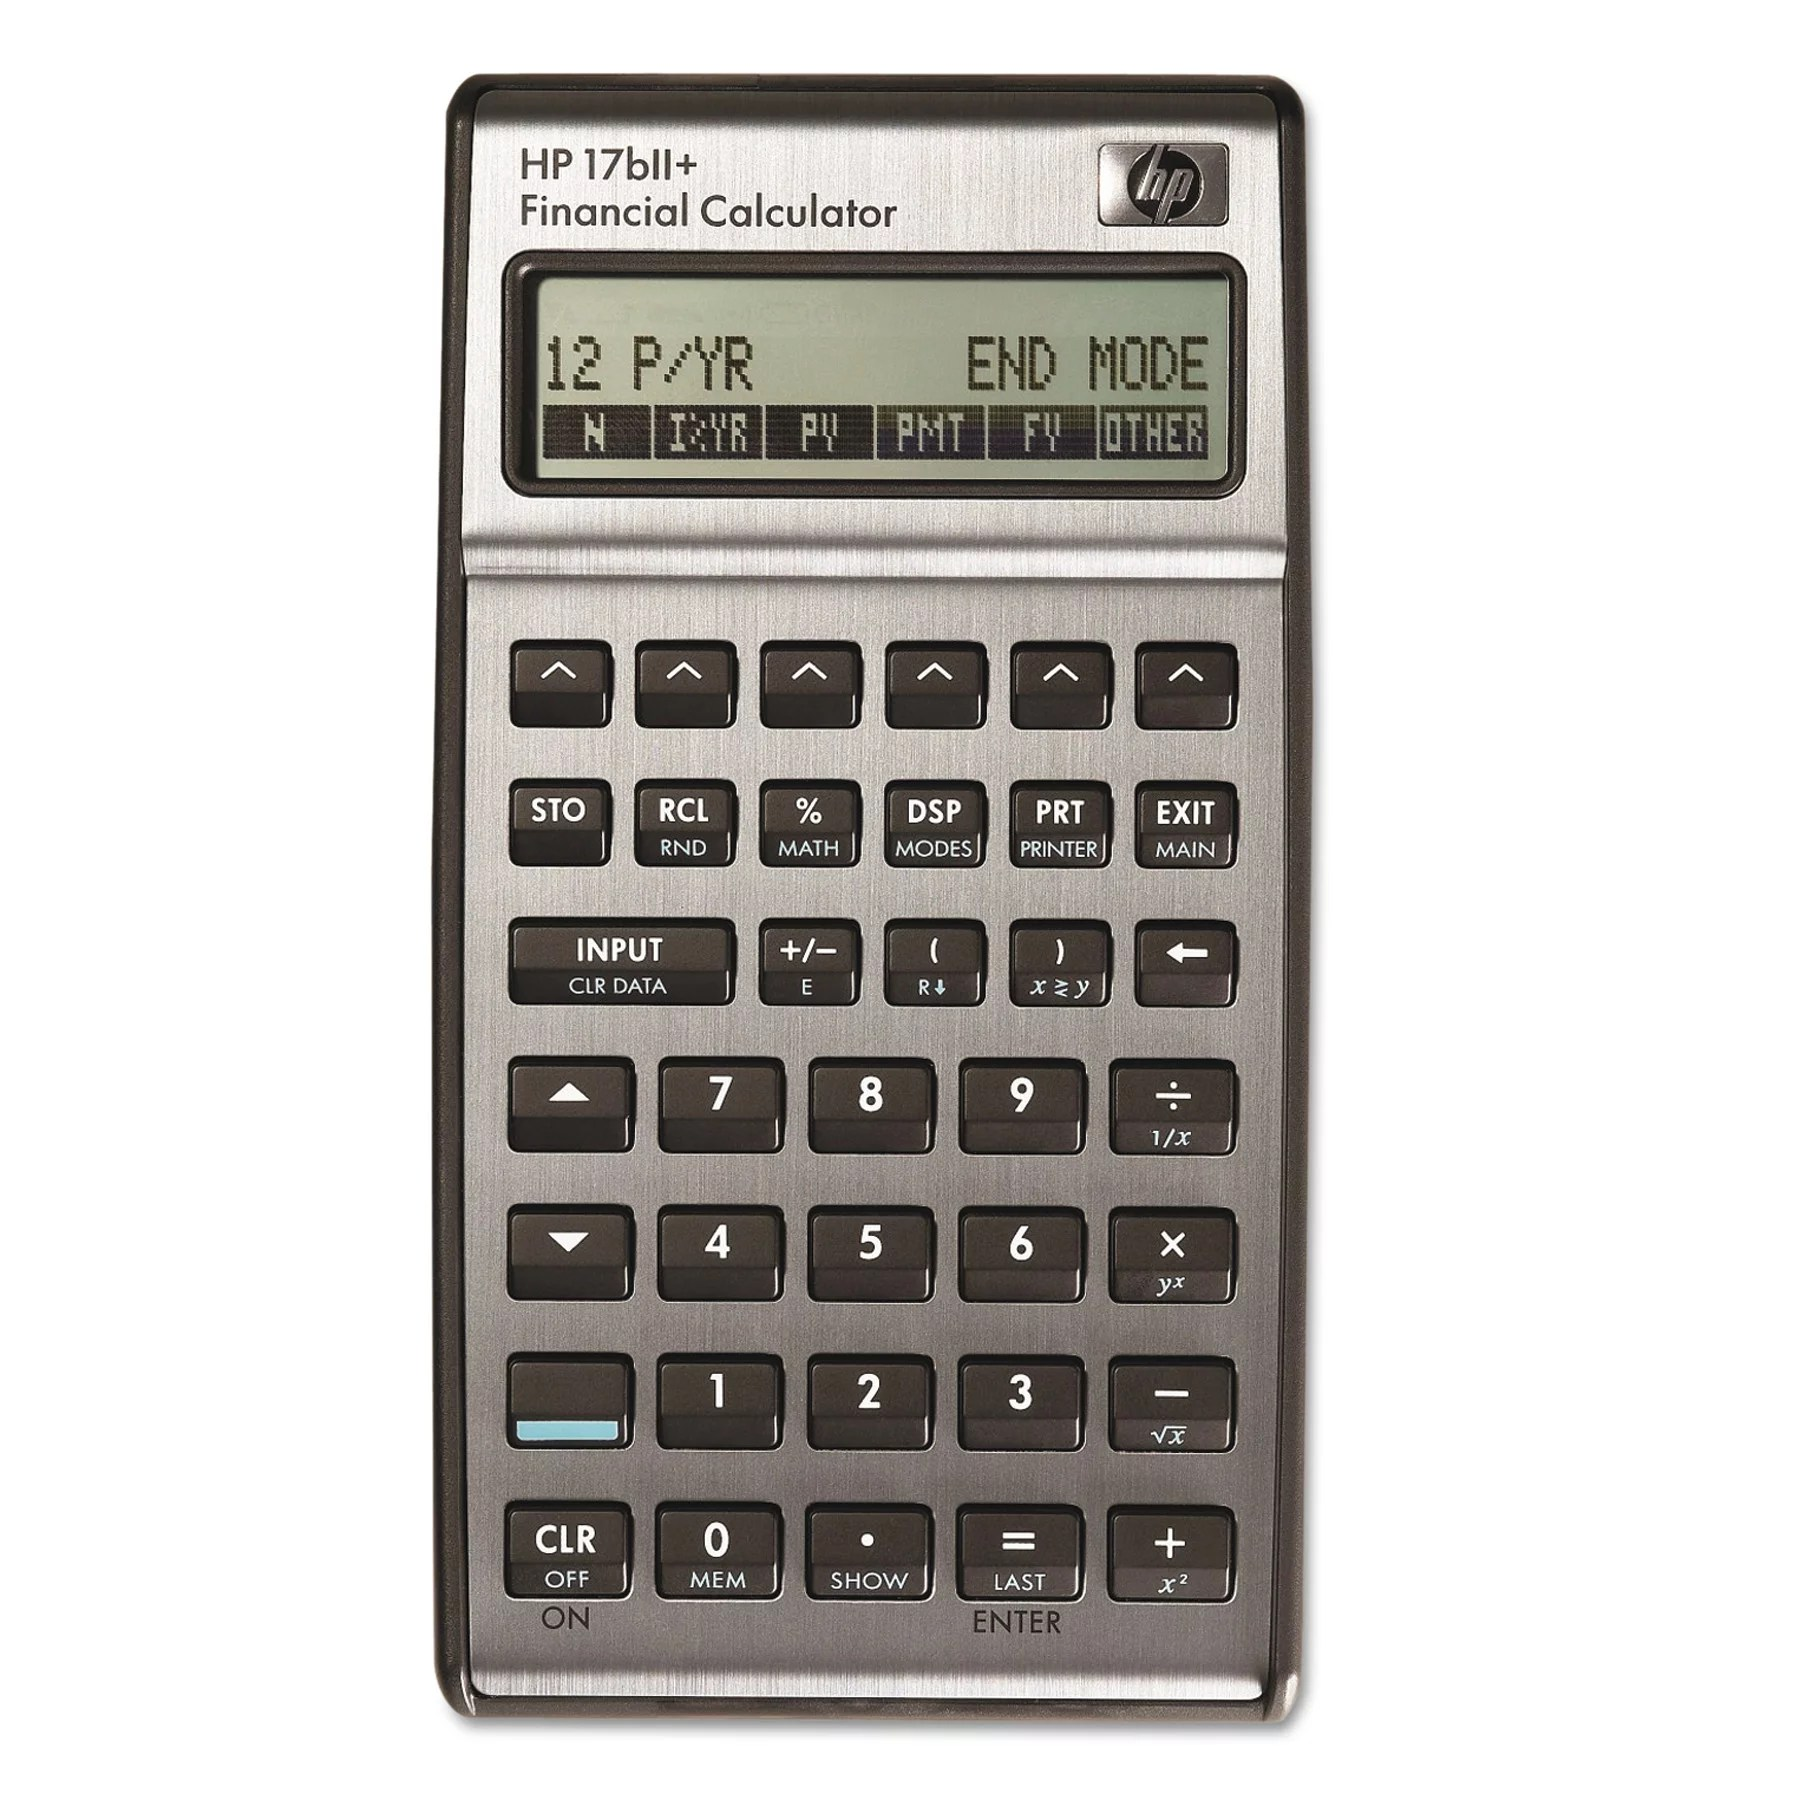 HP 17bII+ Financial Calculator, 22-Digit LCD - Walmart - financial calculator